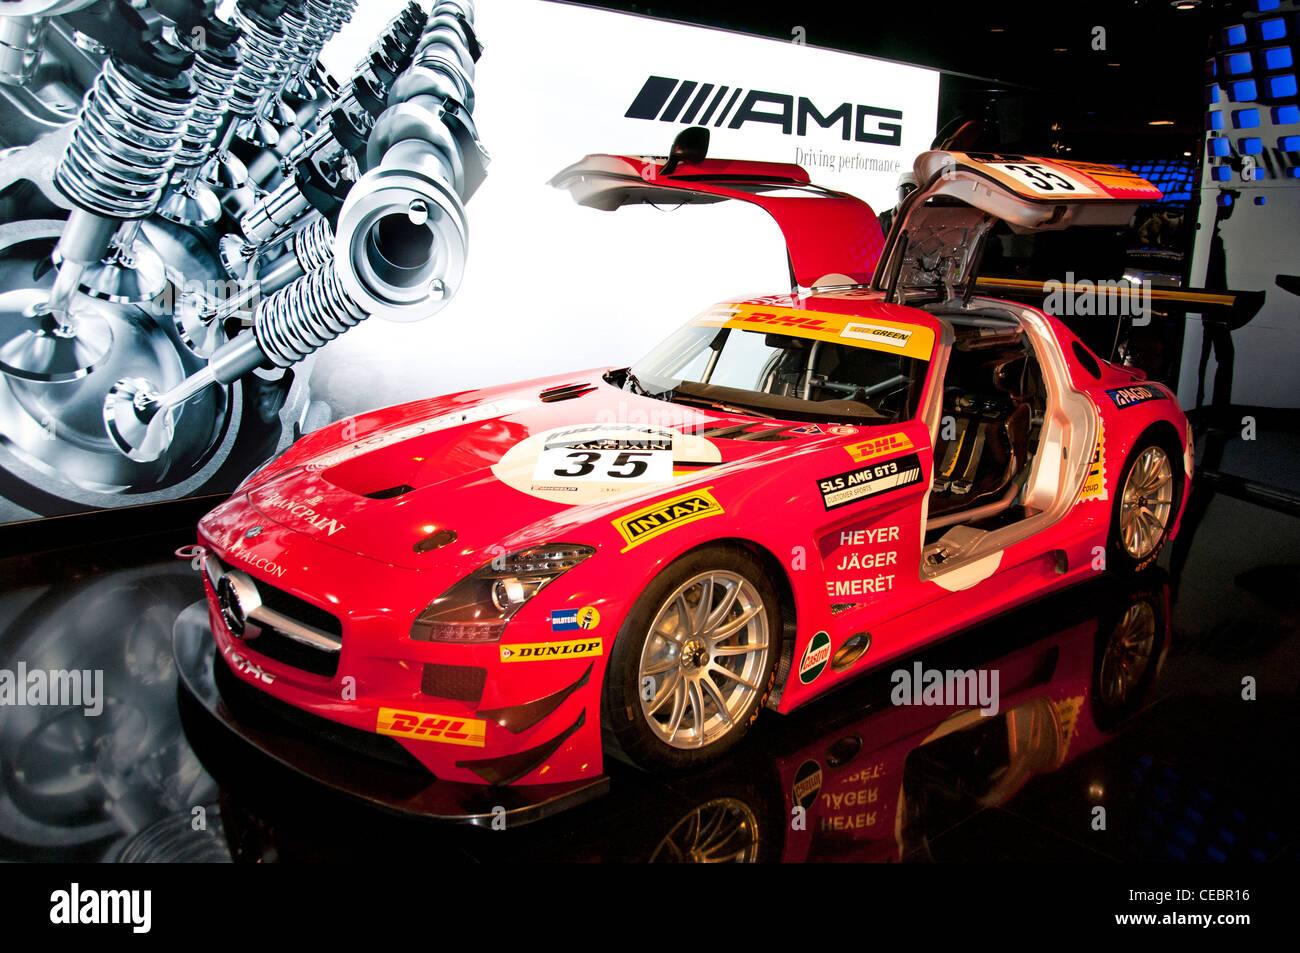 mercedes benz sls amg gt3 racing car showroom champs elysees paris stock photo 43285458 alamy. Black Bedroom Furniture Sets. Home Design Ideas